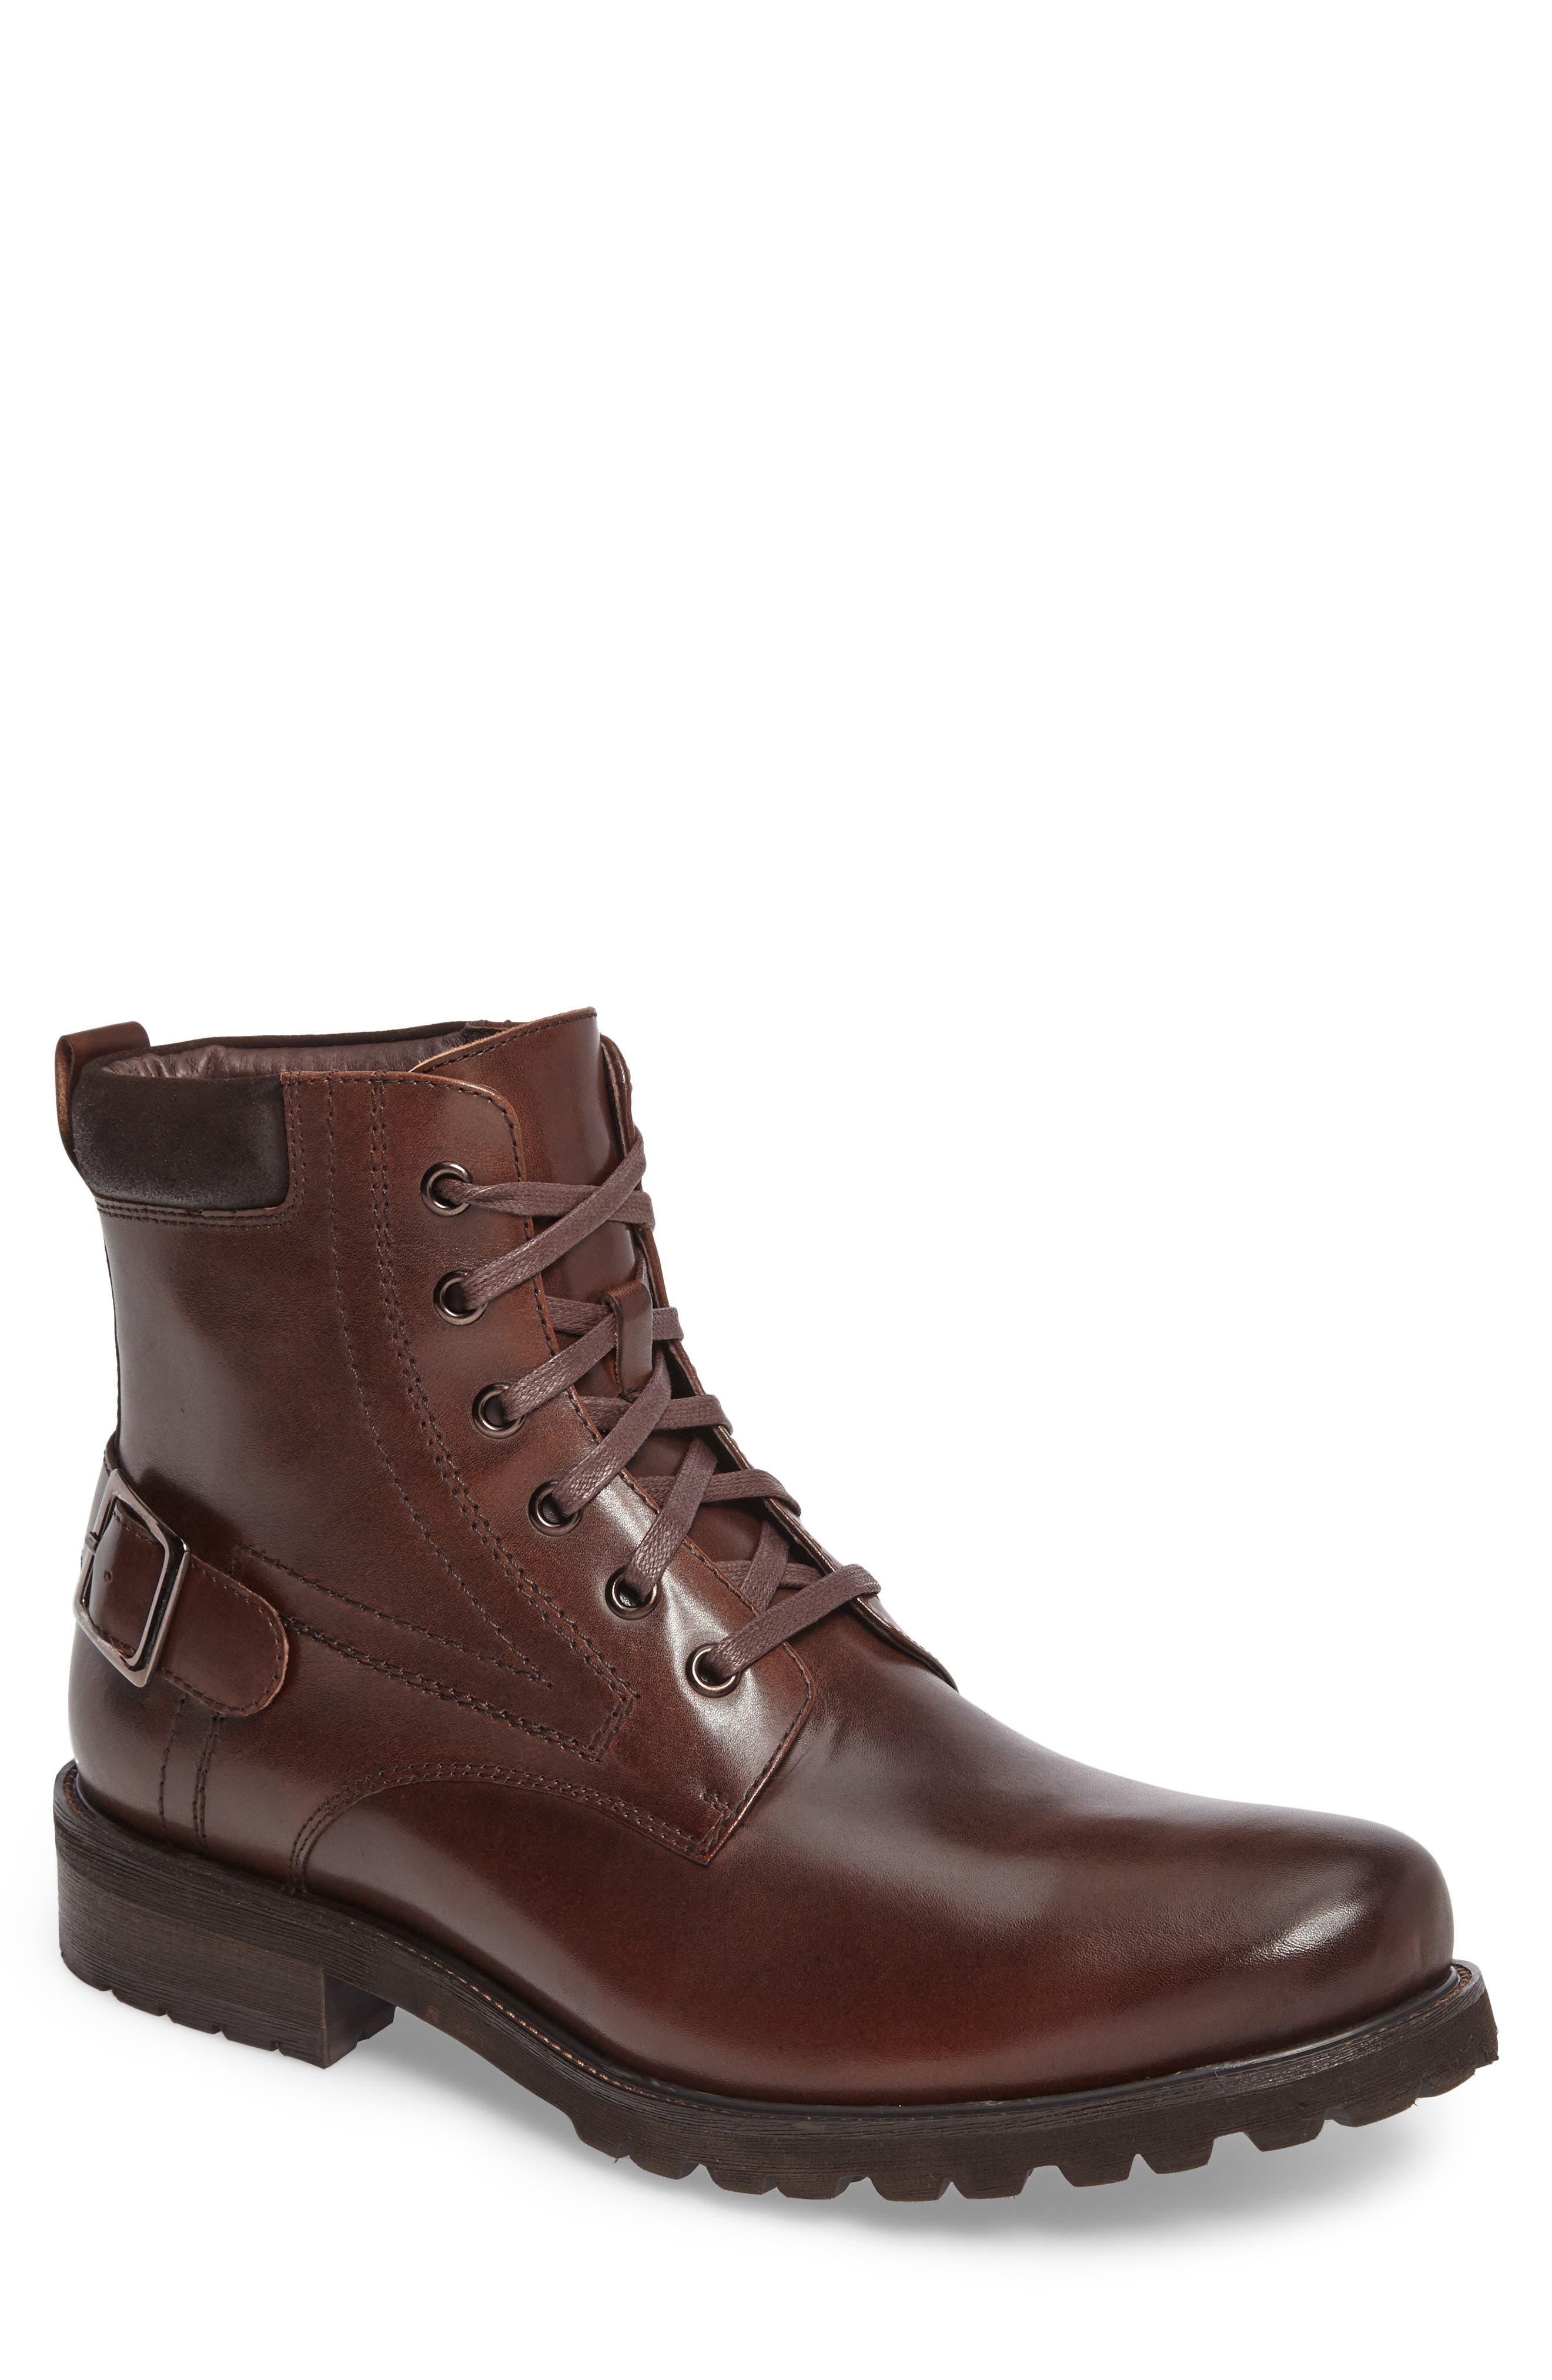 Keller Plain Toe Boot,                             Main thumbnail 1, color,                             Brown Leather